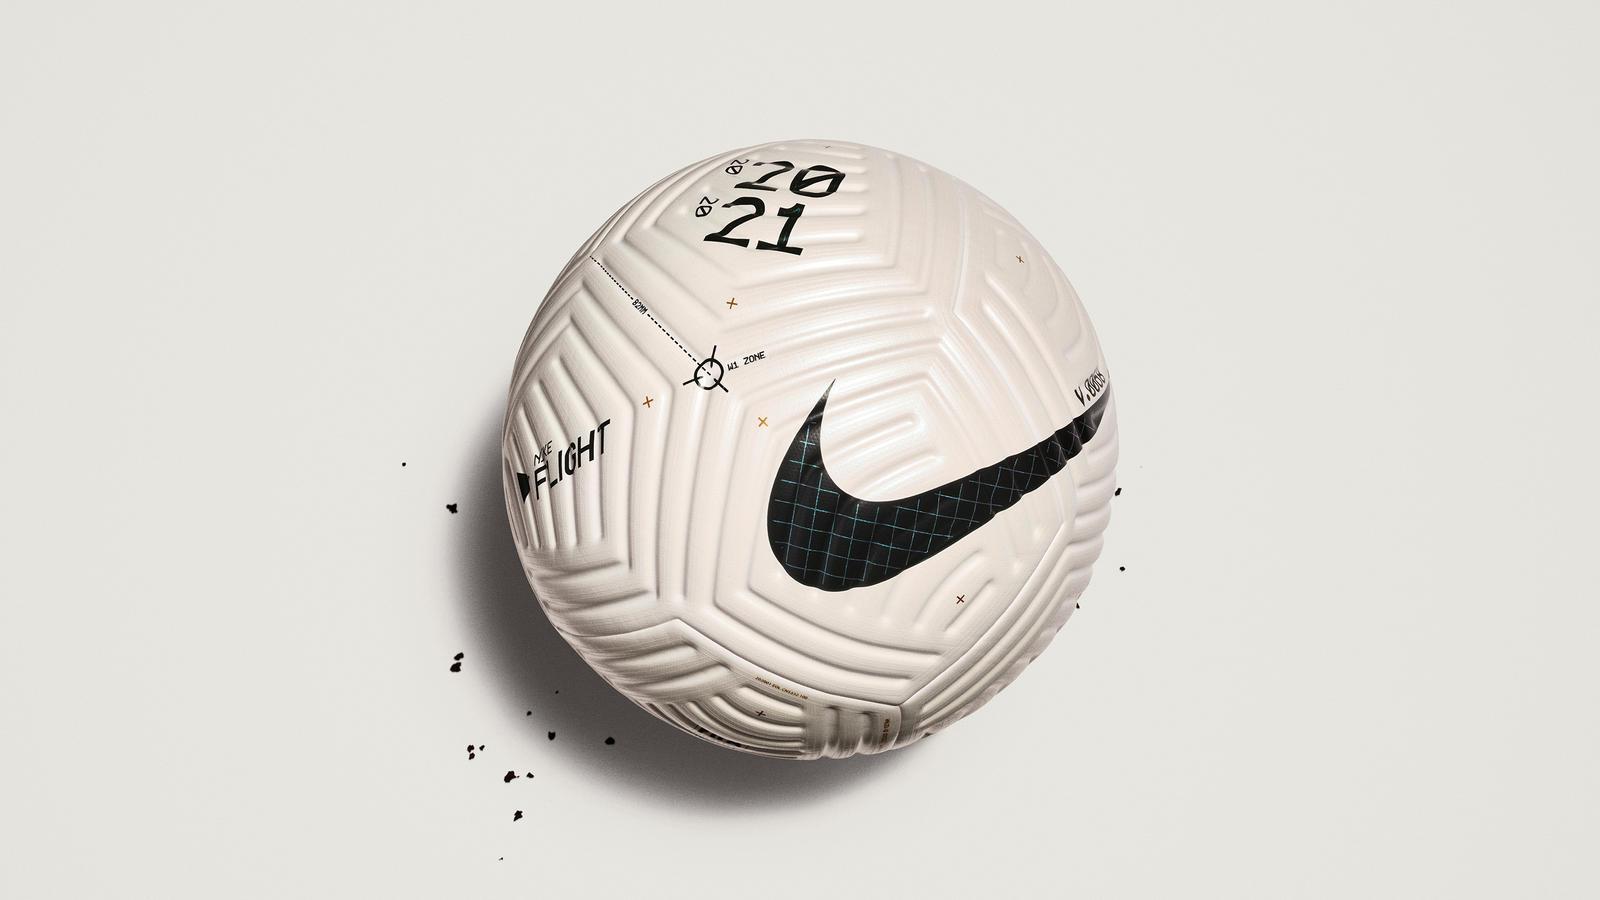 Обои nike, премьер-лига, football, Barclays premier league, мяч. Спорт foto 9